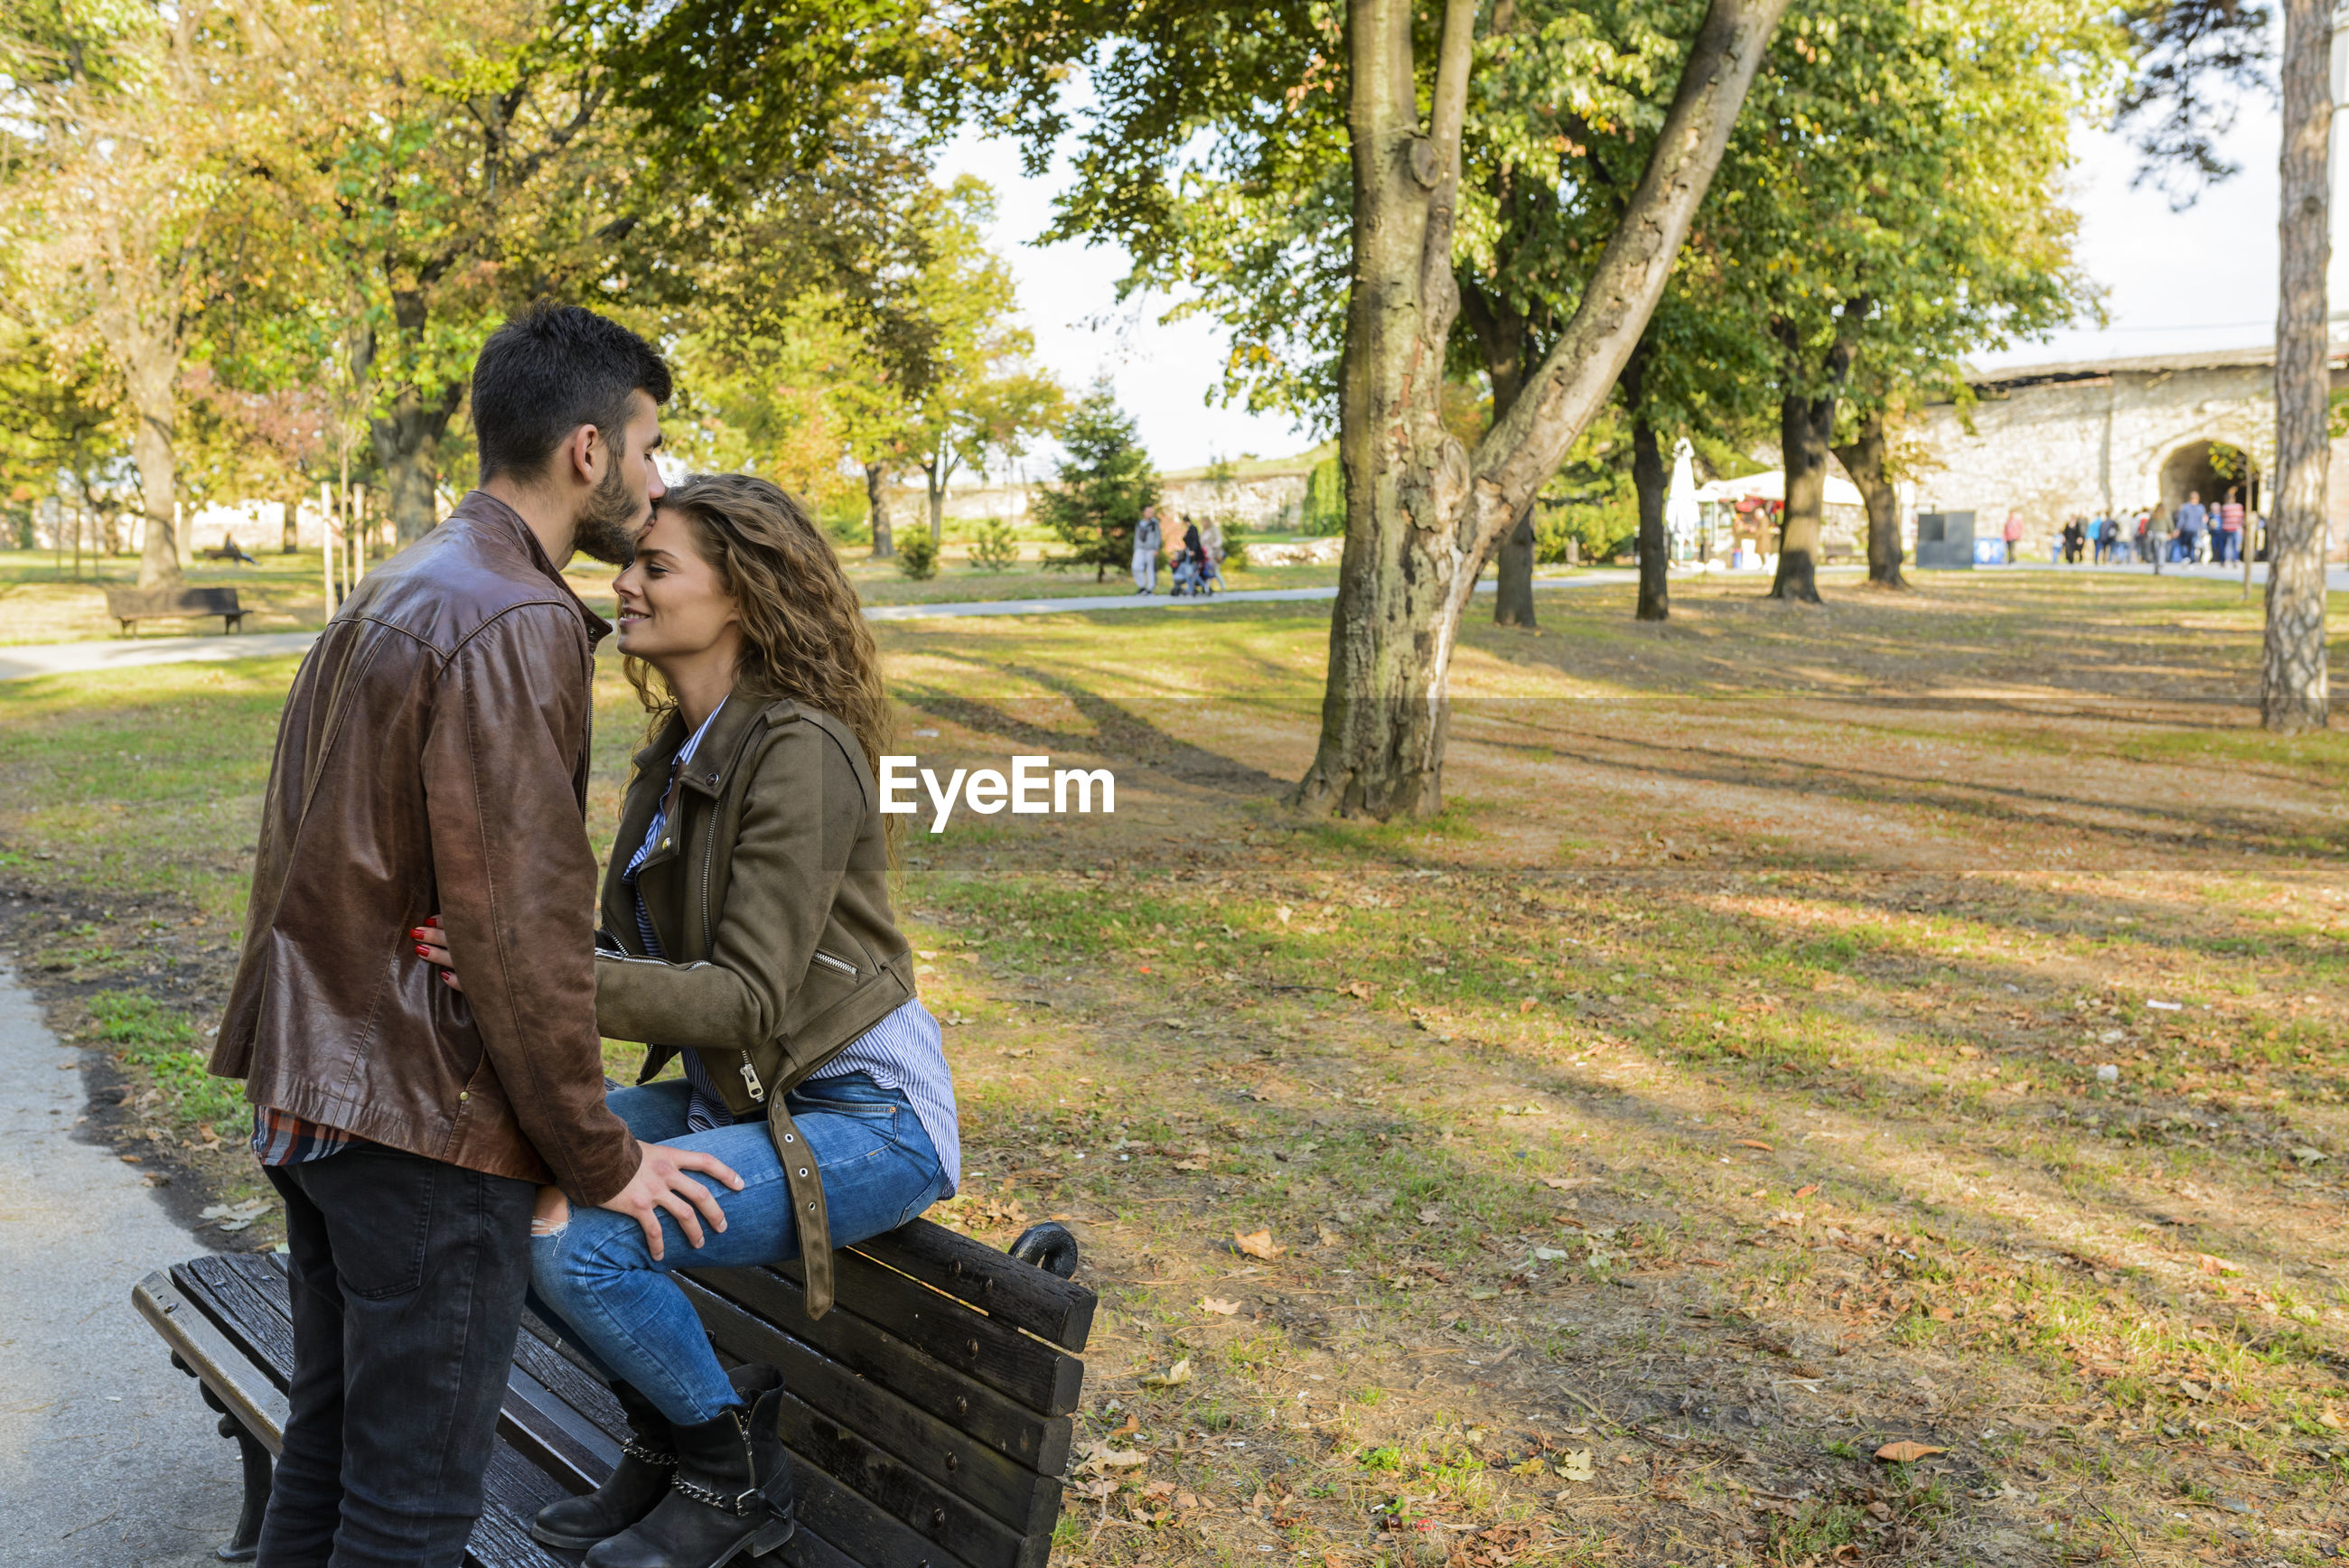 Man kissing on woman heard against trees